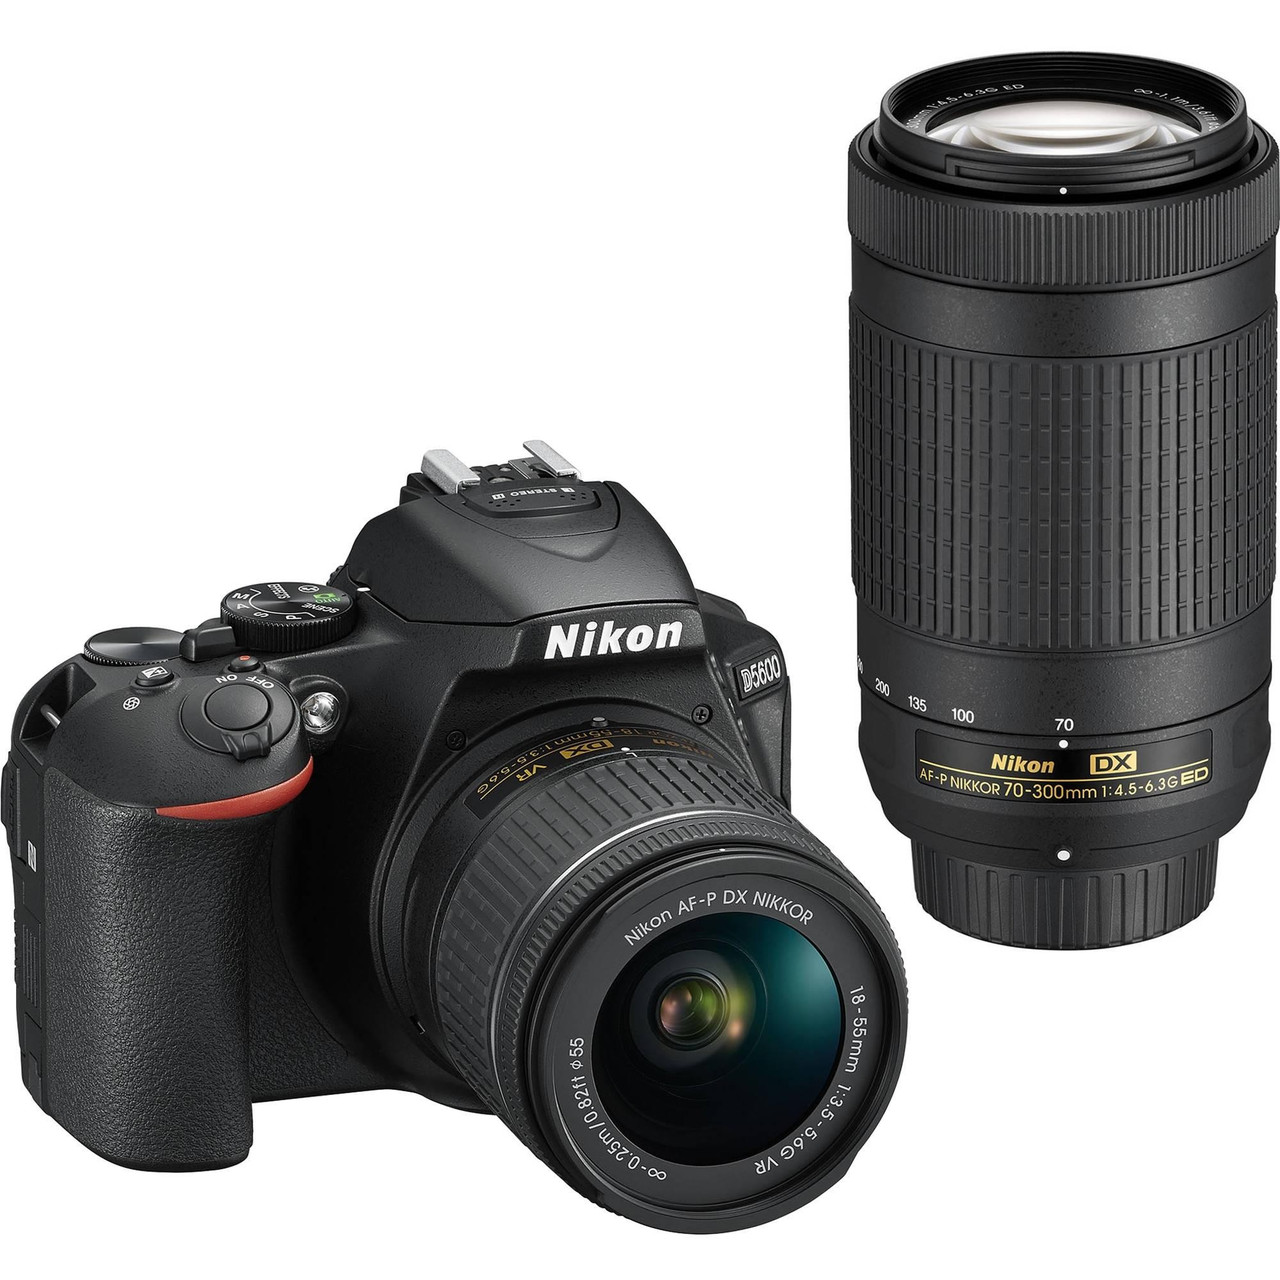 Зеркальный фотоаппарат Nikon D5600 kit (18-55mm+70-300mm)